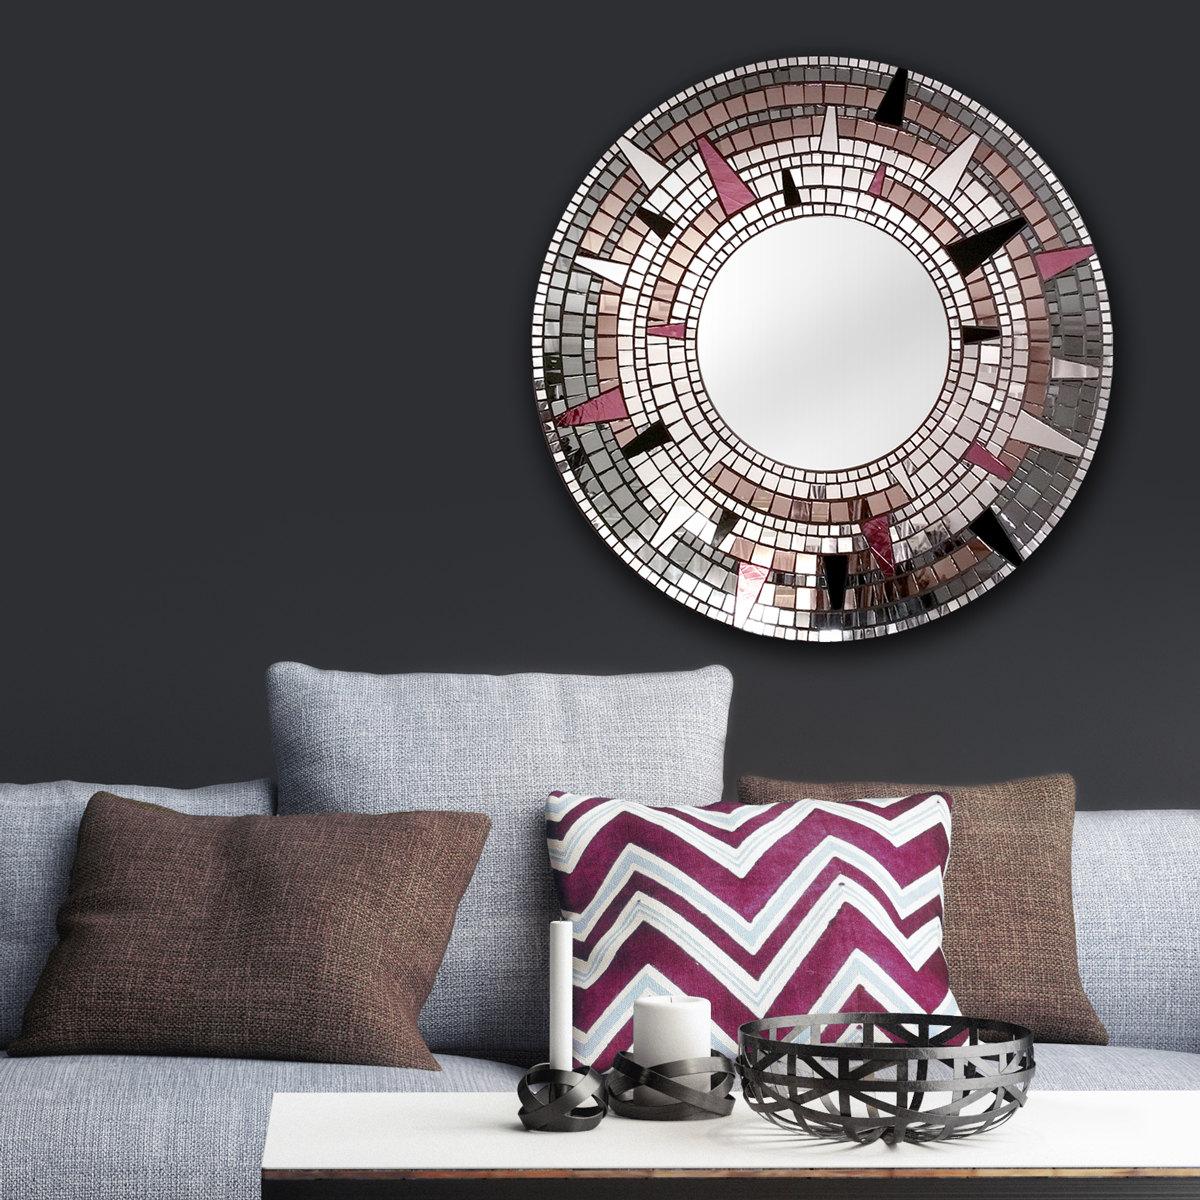 Round Mosaic Wall Decor : Handmade round mirror sparkly wall decor mosaic